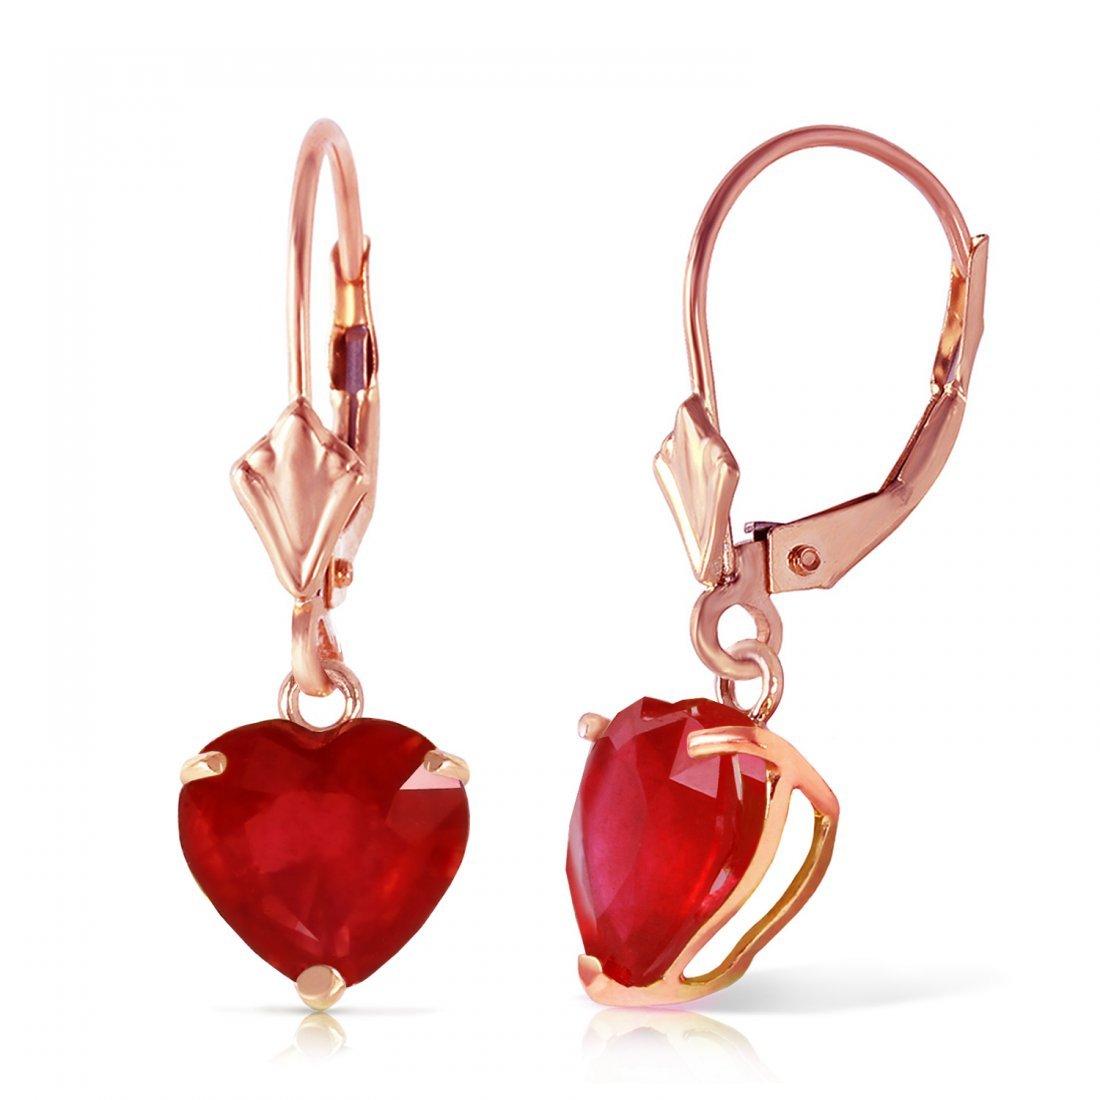 Genuine 2.9 ctw Ruby Earrings Jewelry 14KT Rose Gold -